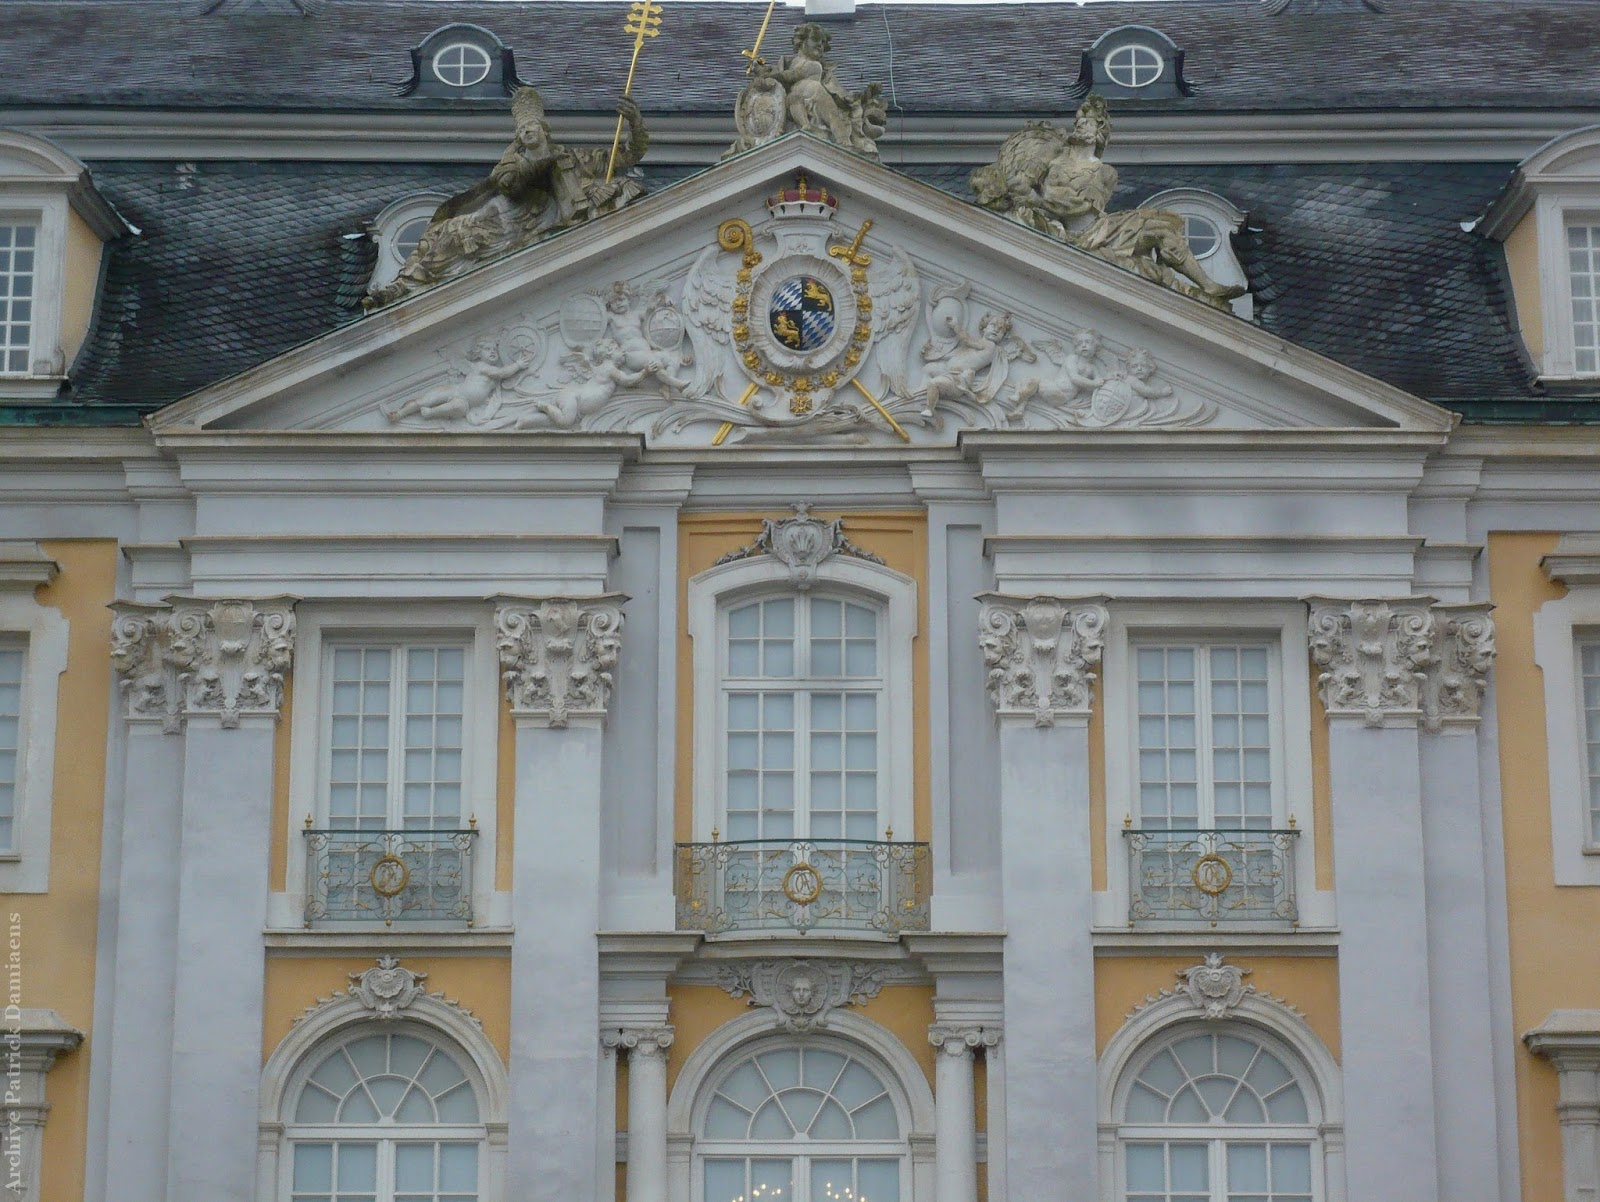 Ornamentsnijder patrick damiaens juli 2016 - Decoratie van trappenhuis ...